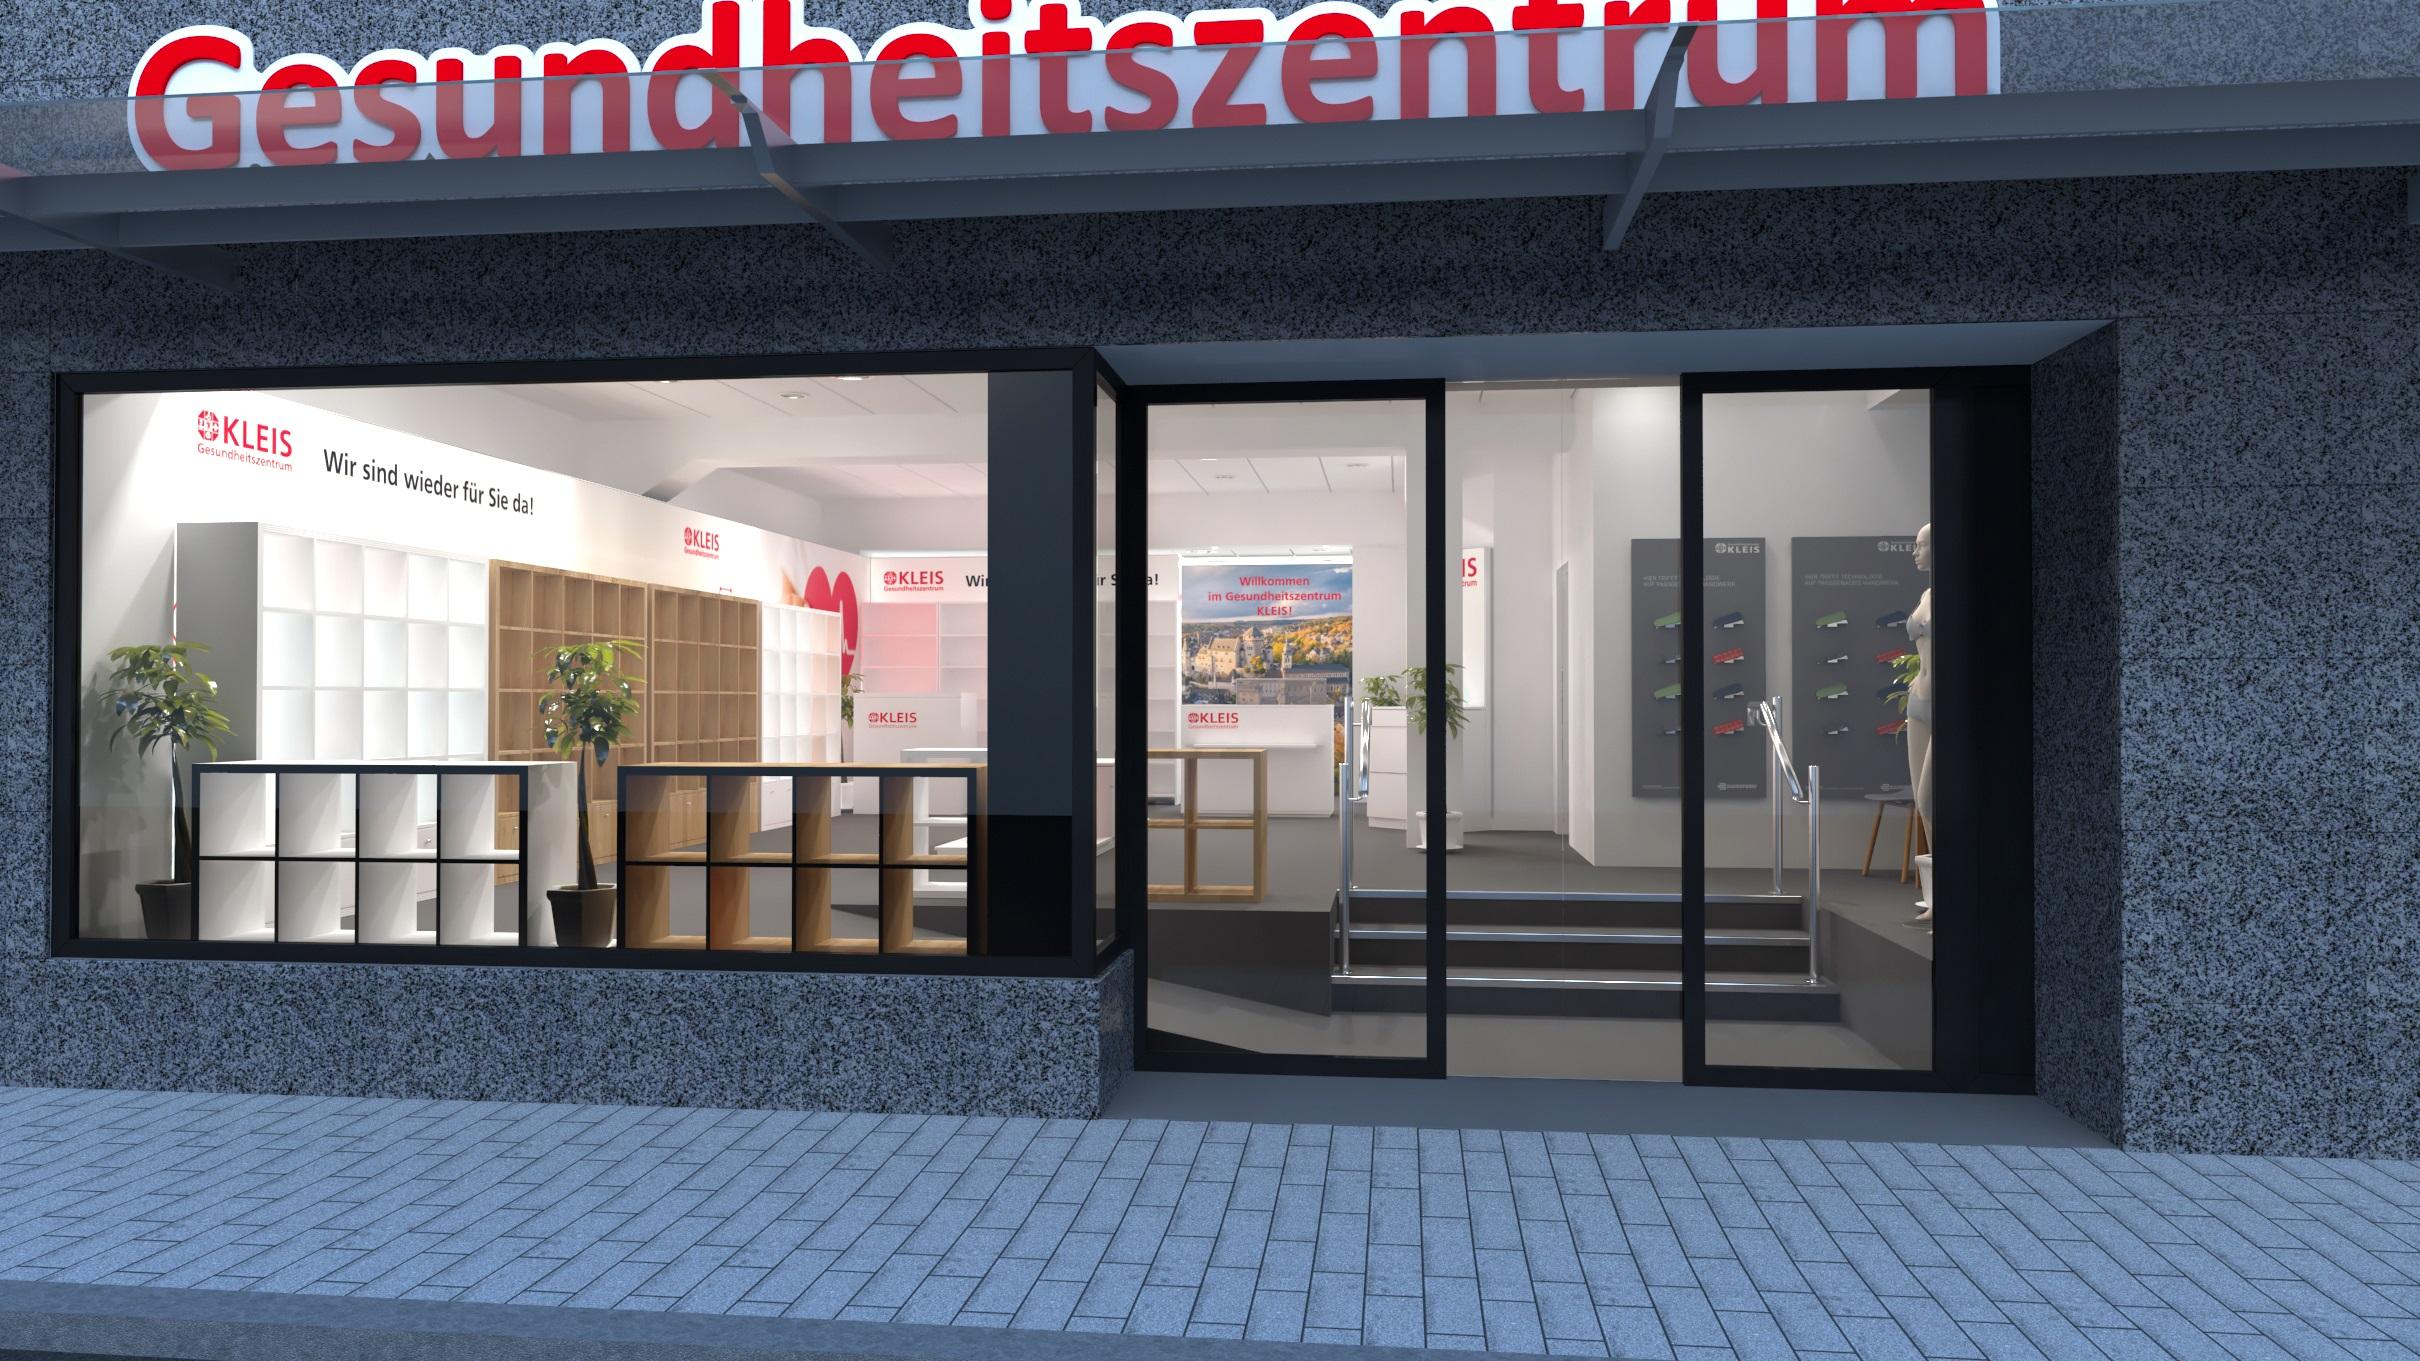 Gesundheitszentrum KLEIS Stolberg-V07-02-1